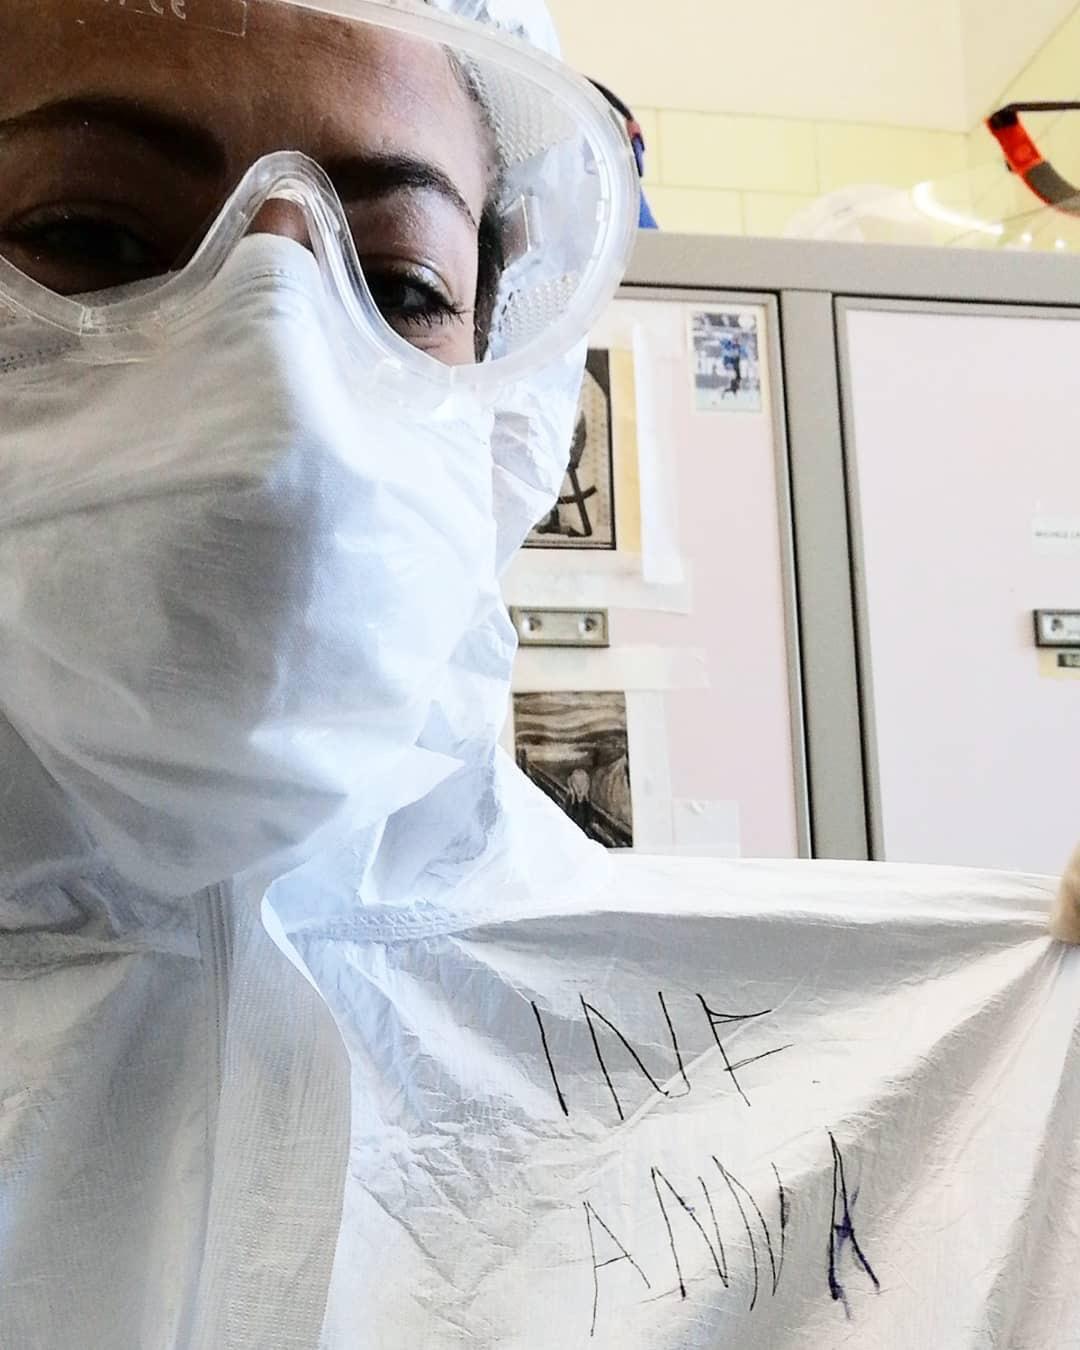 italy nurses under pressure